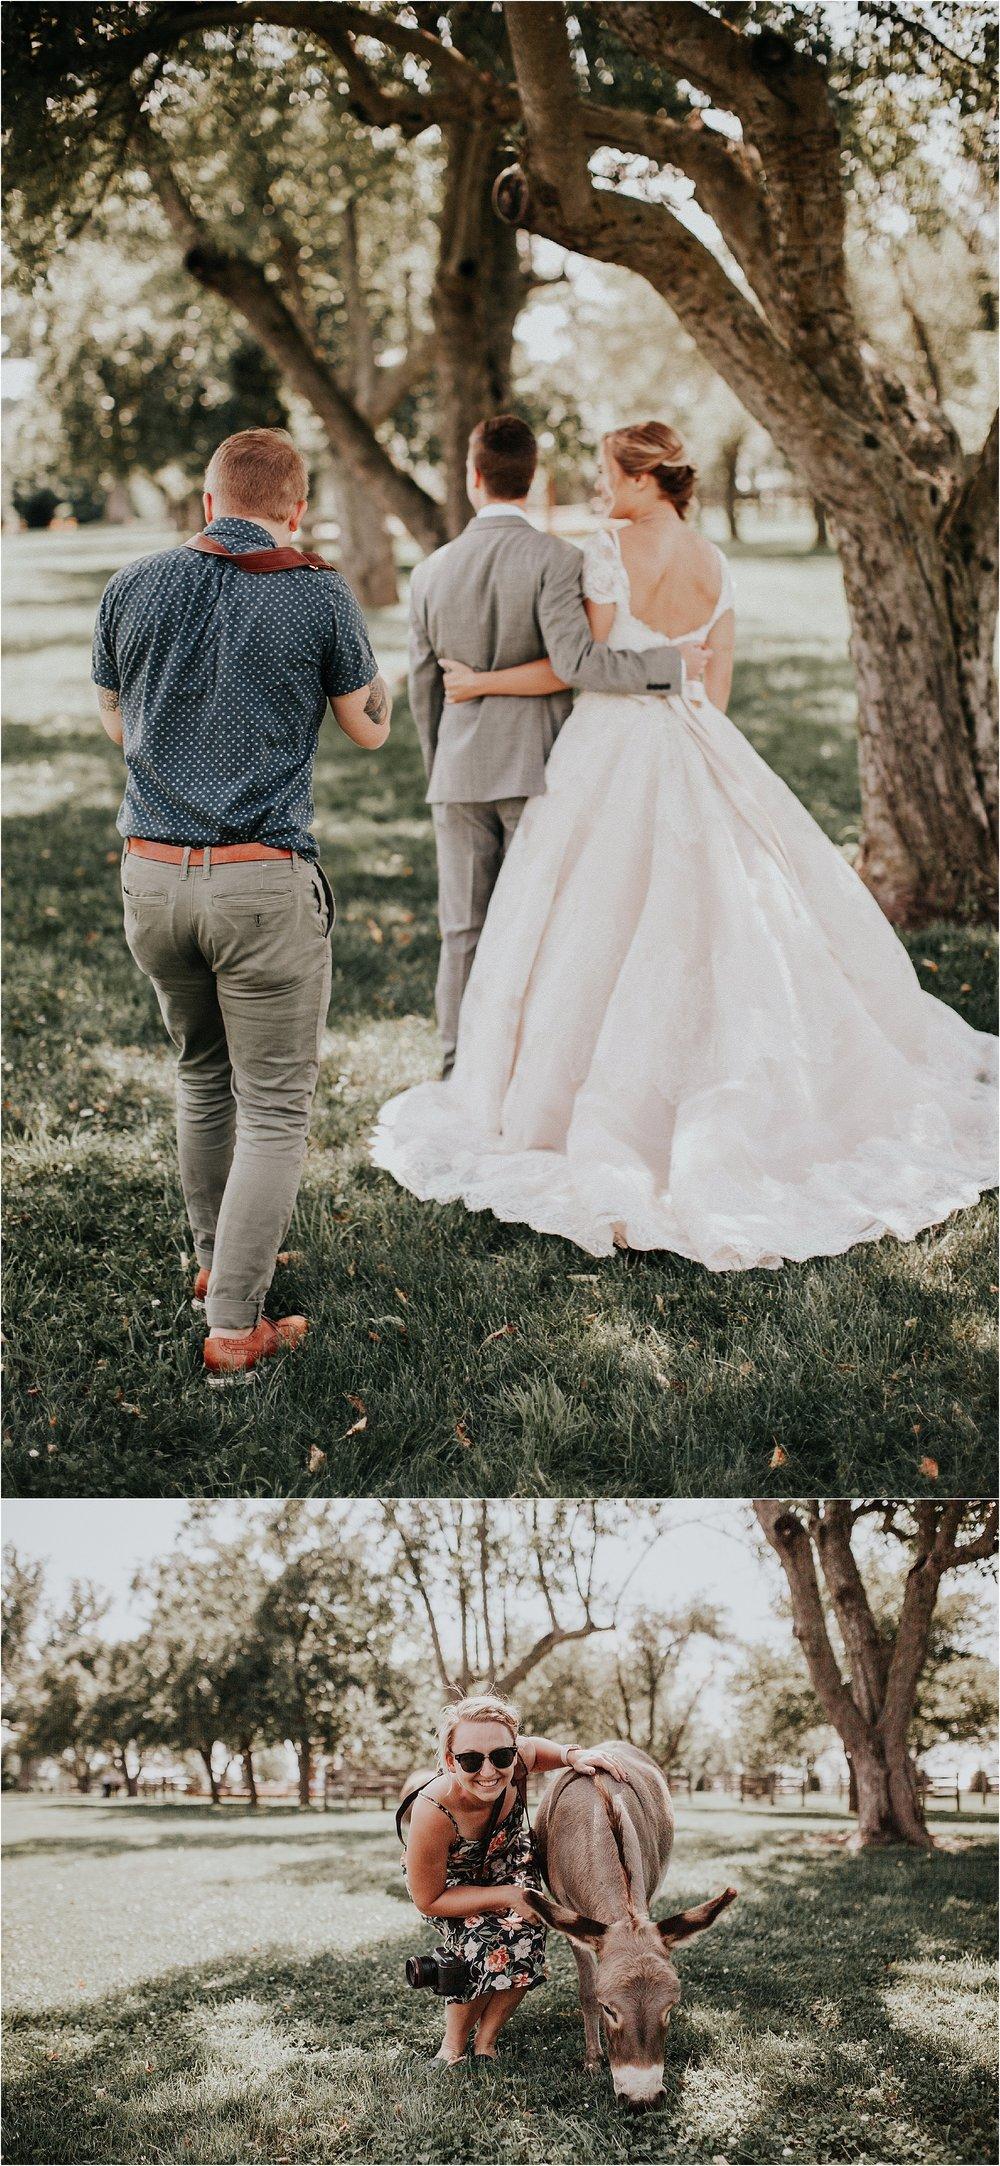 Sarah_Brookhart_PA_MD_Wedding_Photographer_0005.jpg